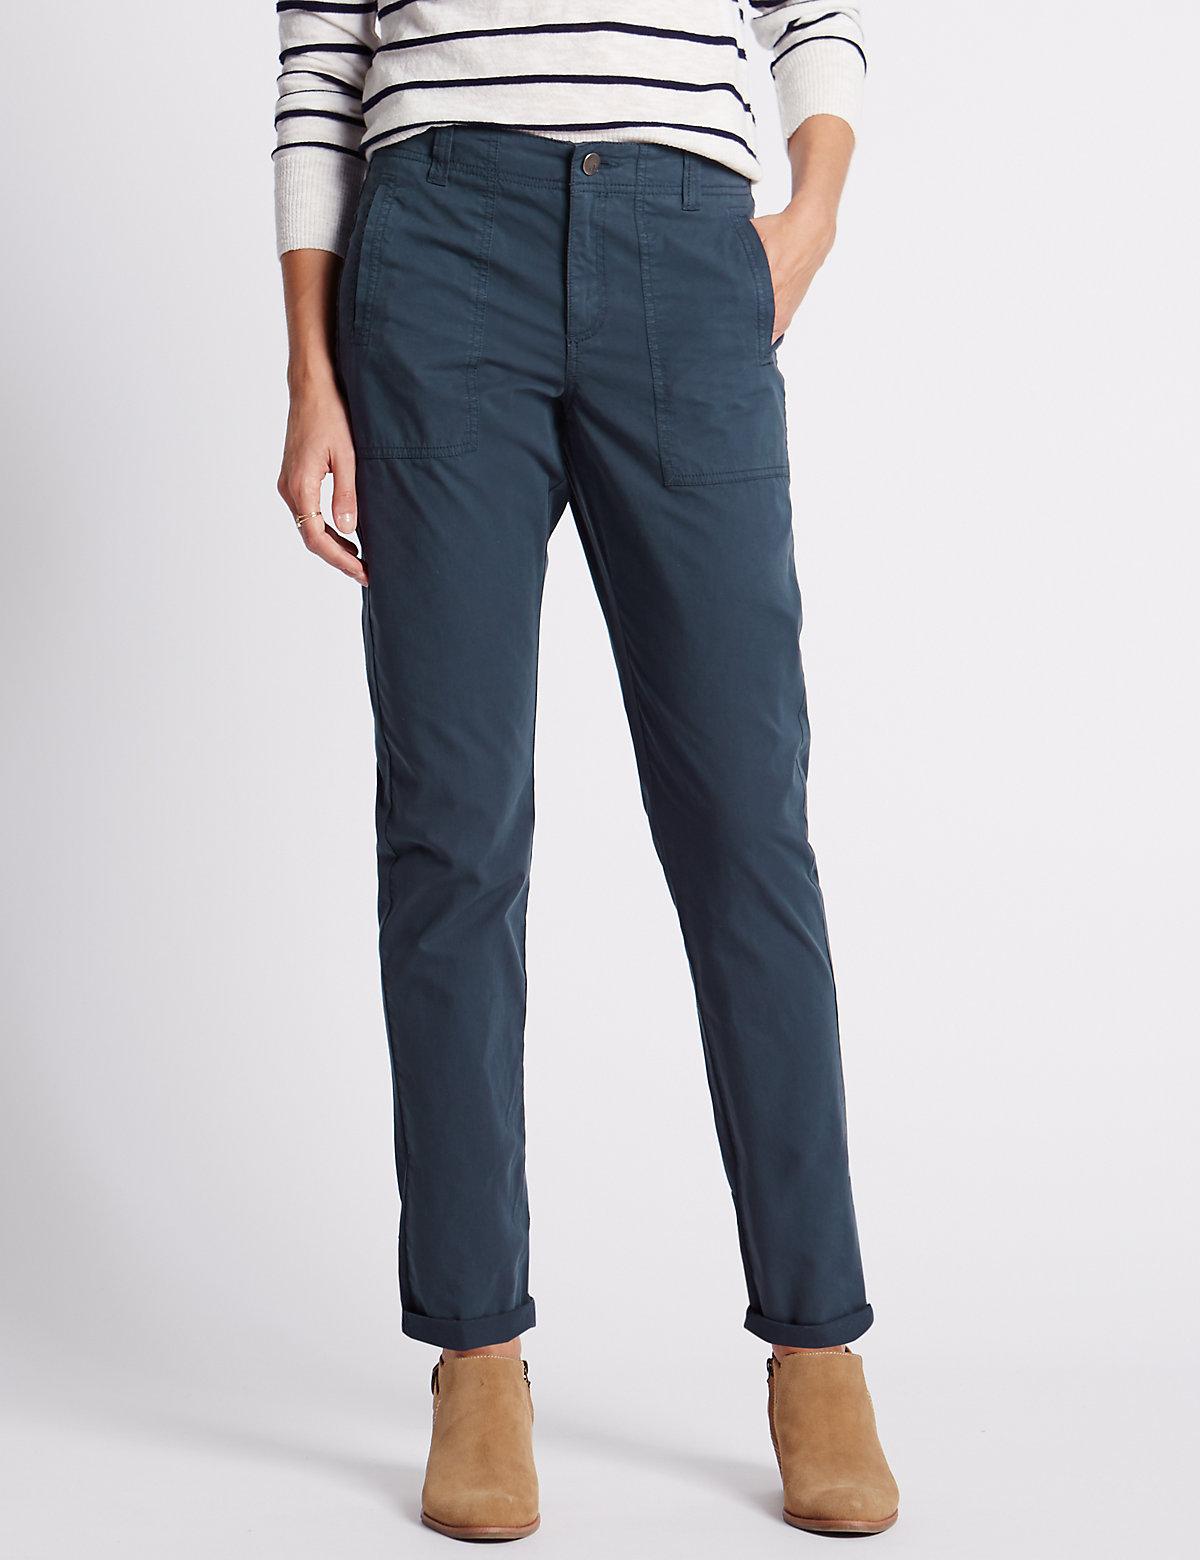 Indigo Collection Pure Cotton Pocket Cargo Trousers